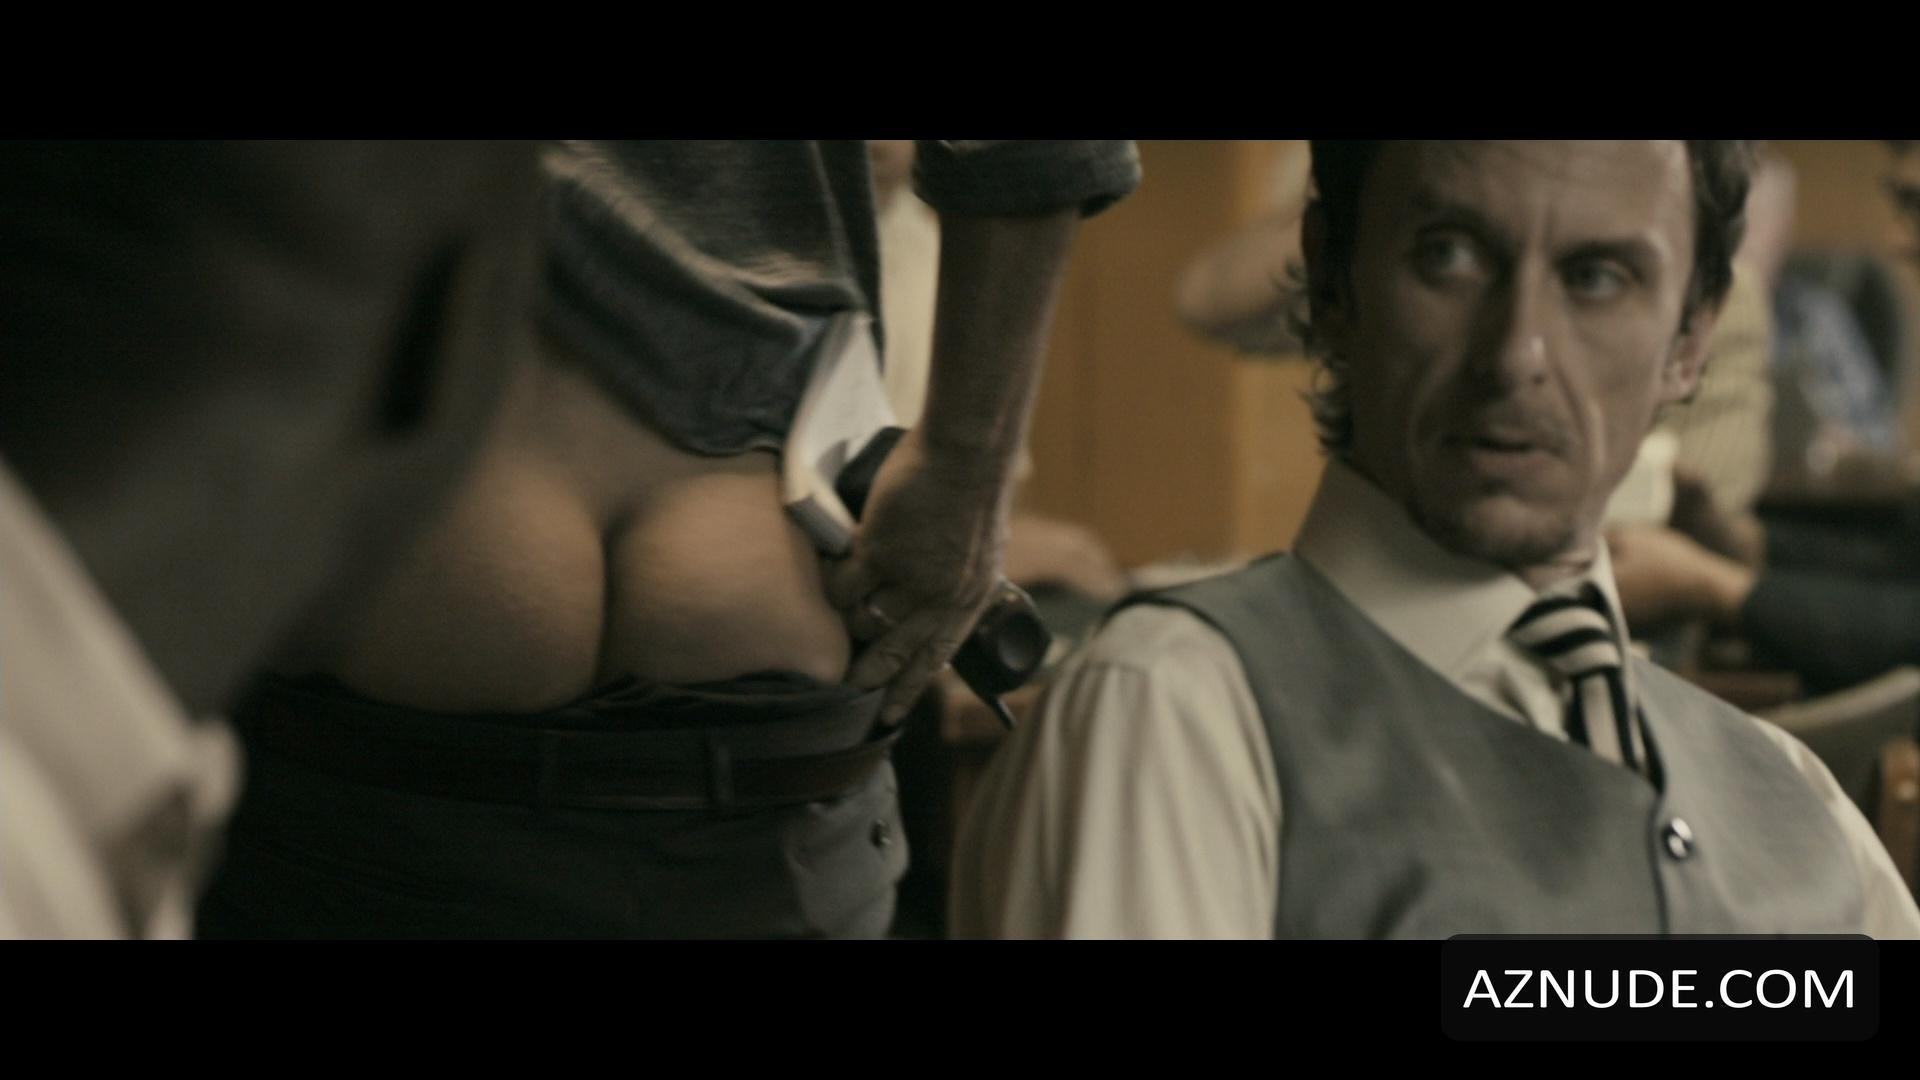 GERARD BUTLER Nude  AZNude Men